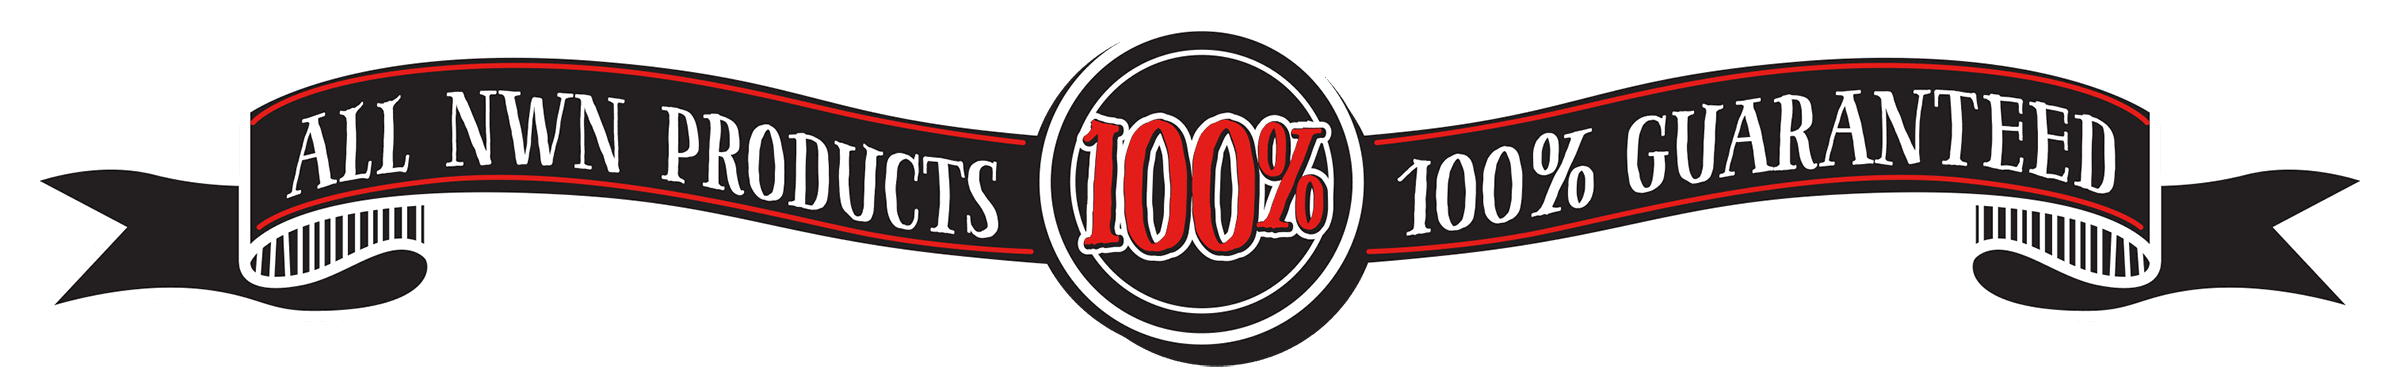 NW Naturals 100% Satisfaction Guarantee